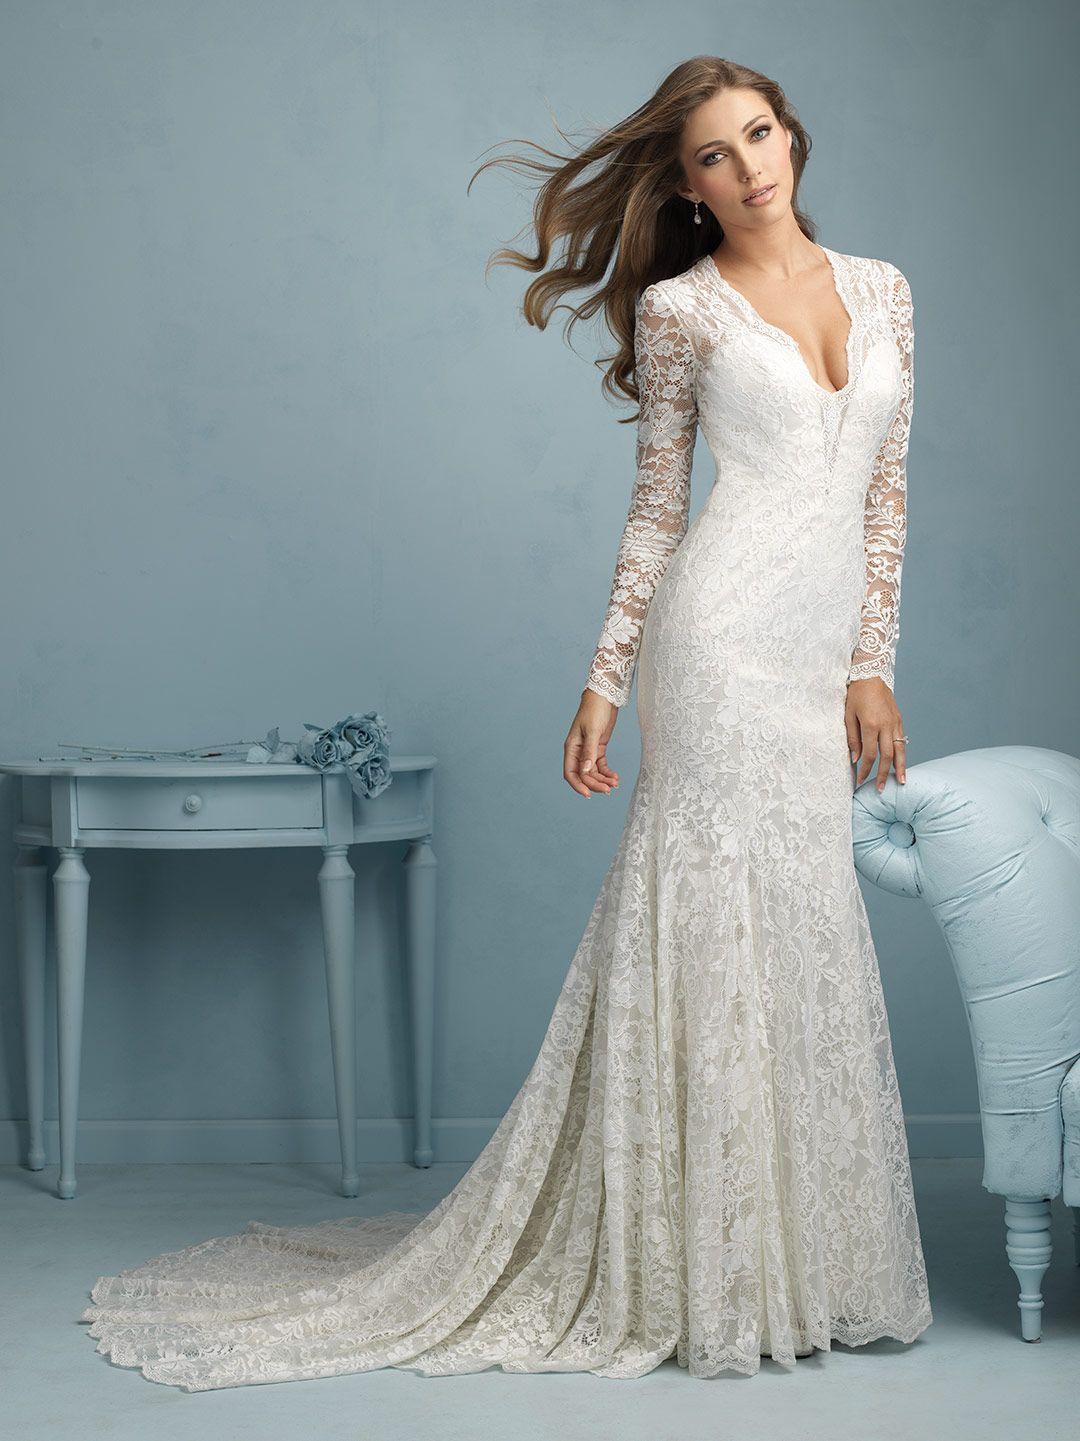 mainimage | Dresses | Pinterest | Amor y Vestiditos